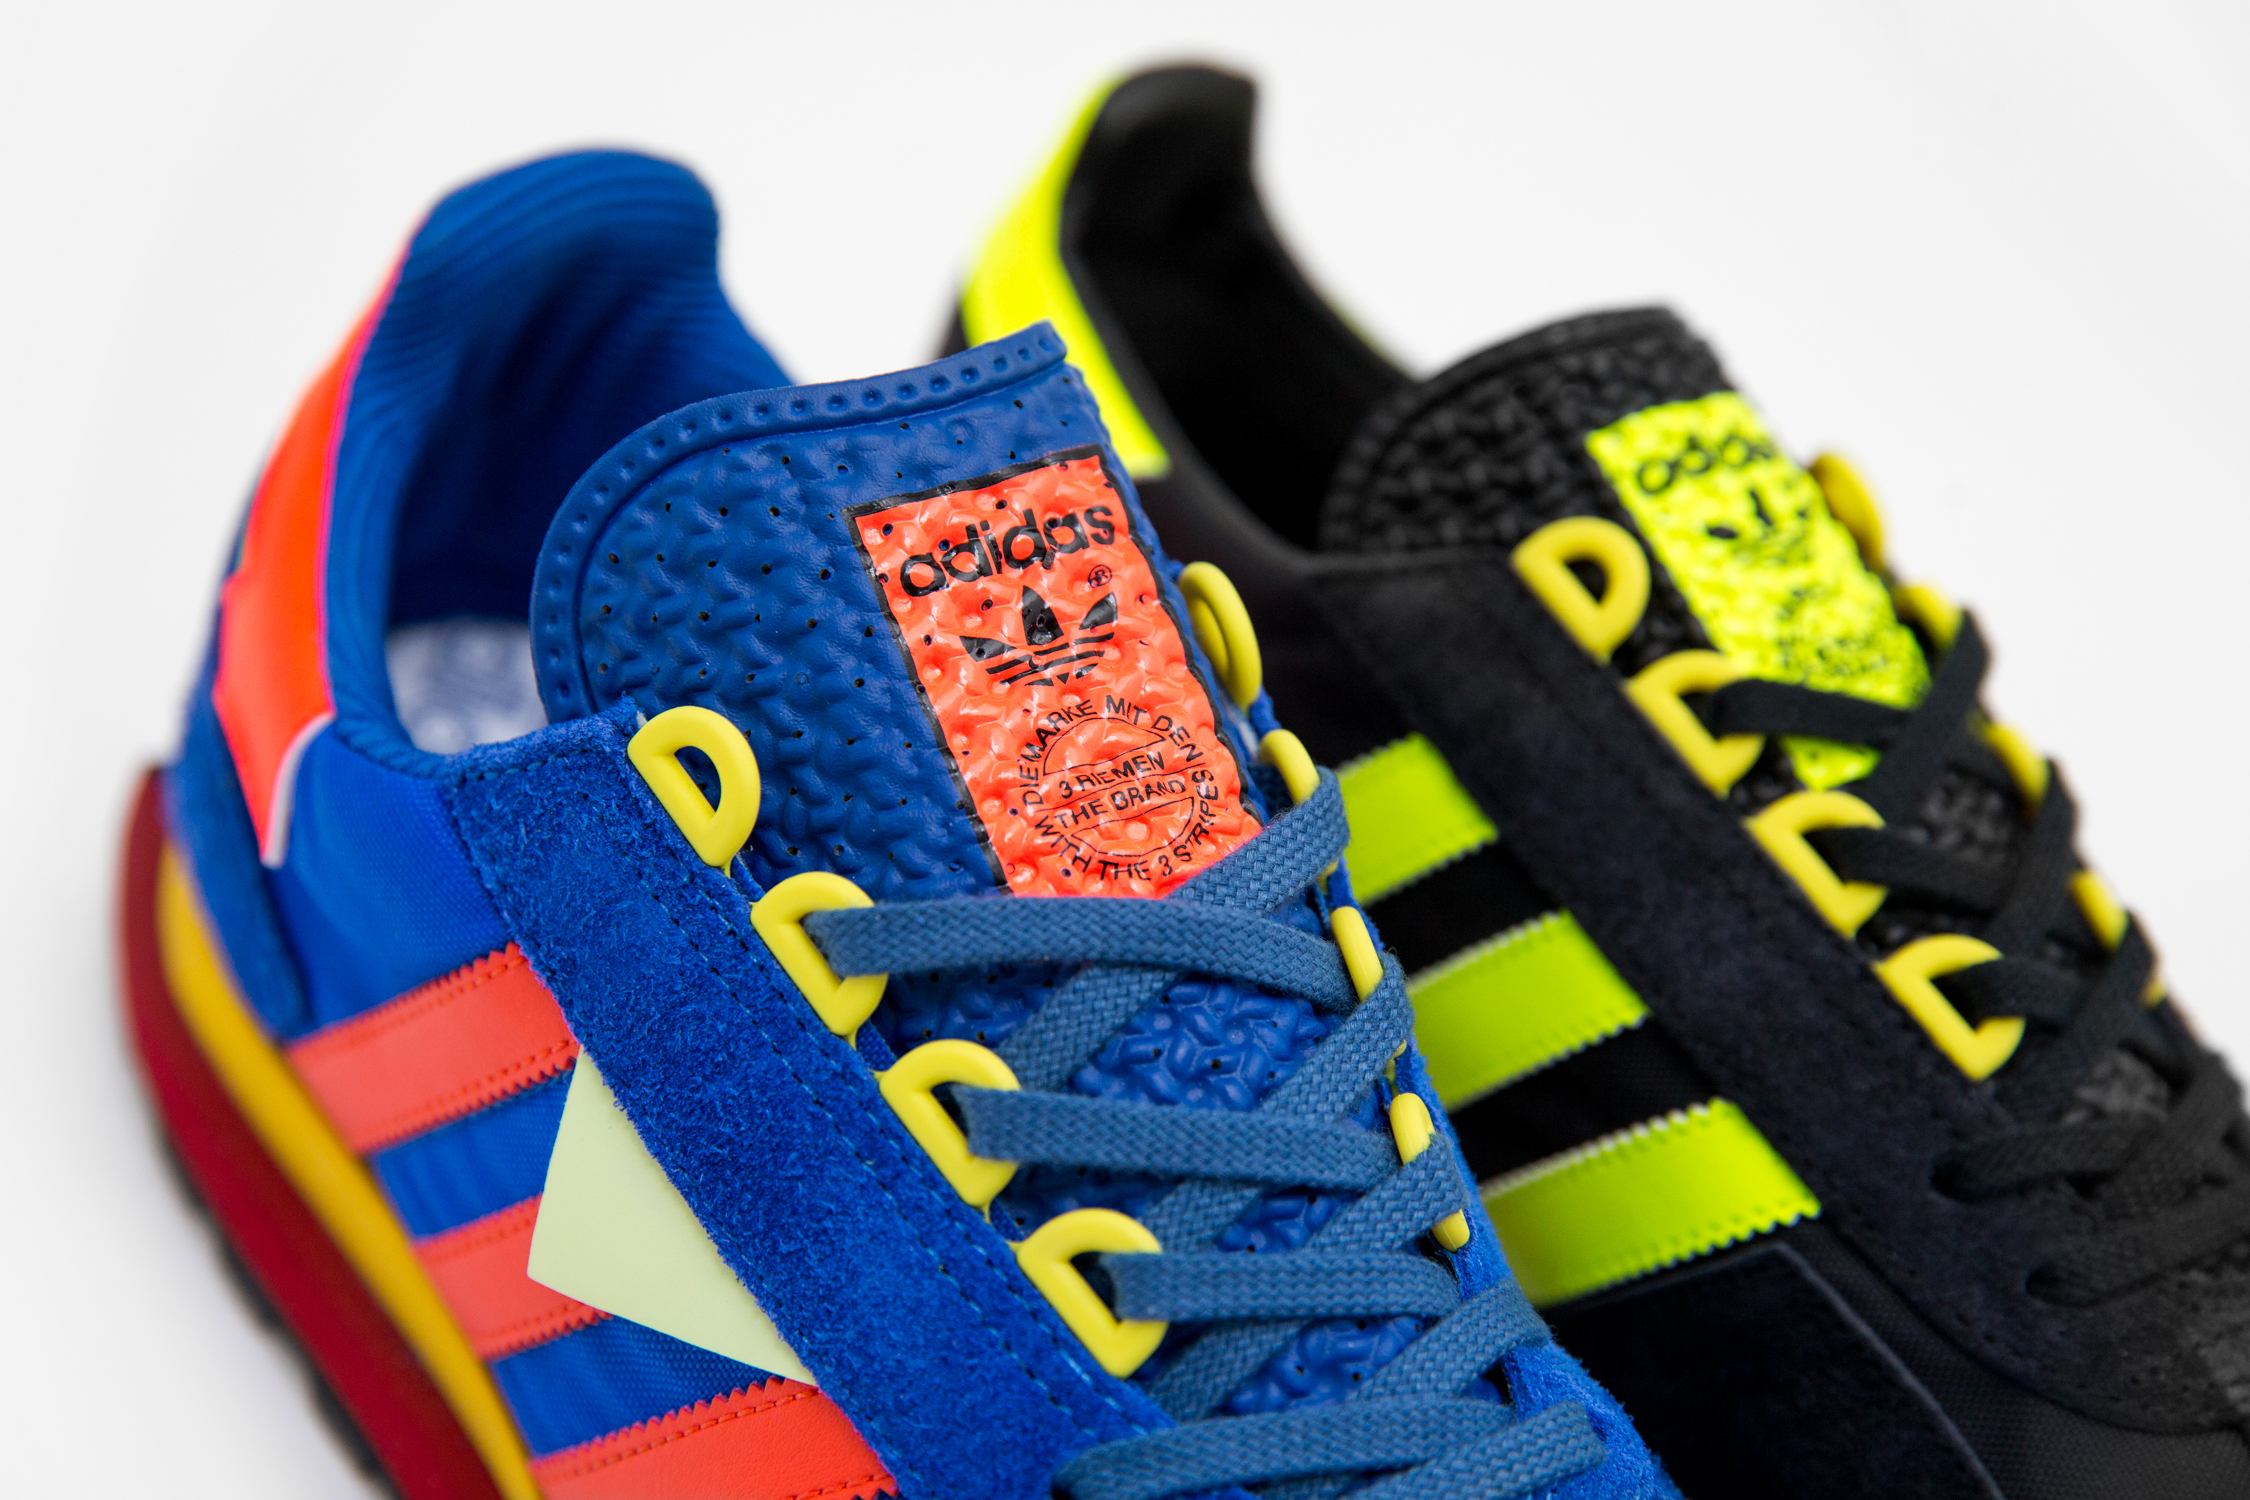 adidas prototype running sneaker